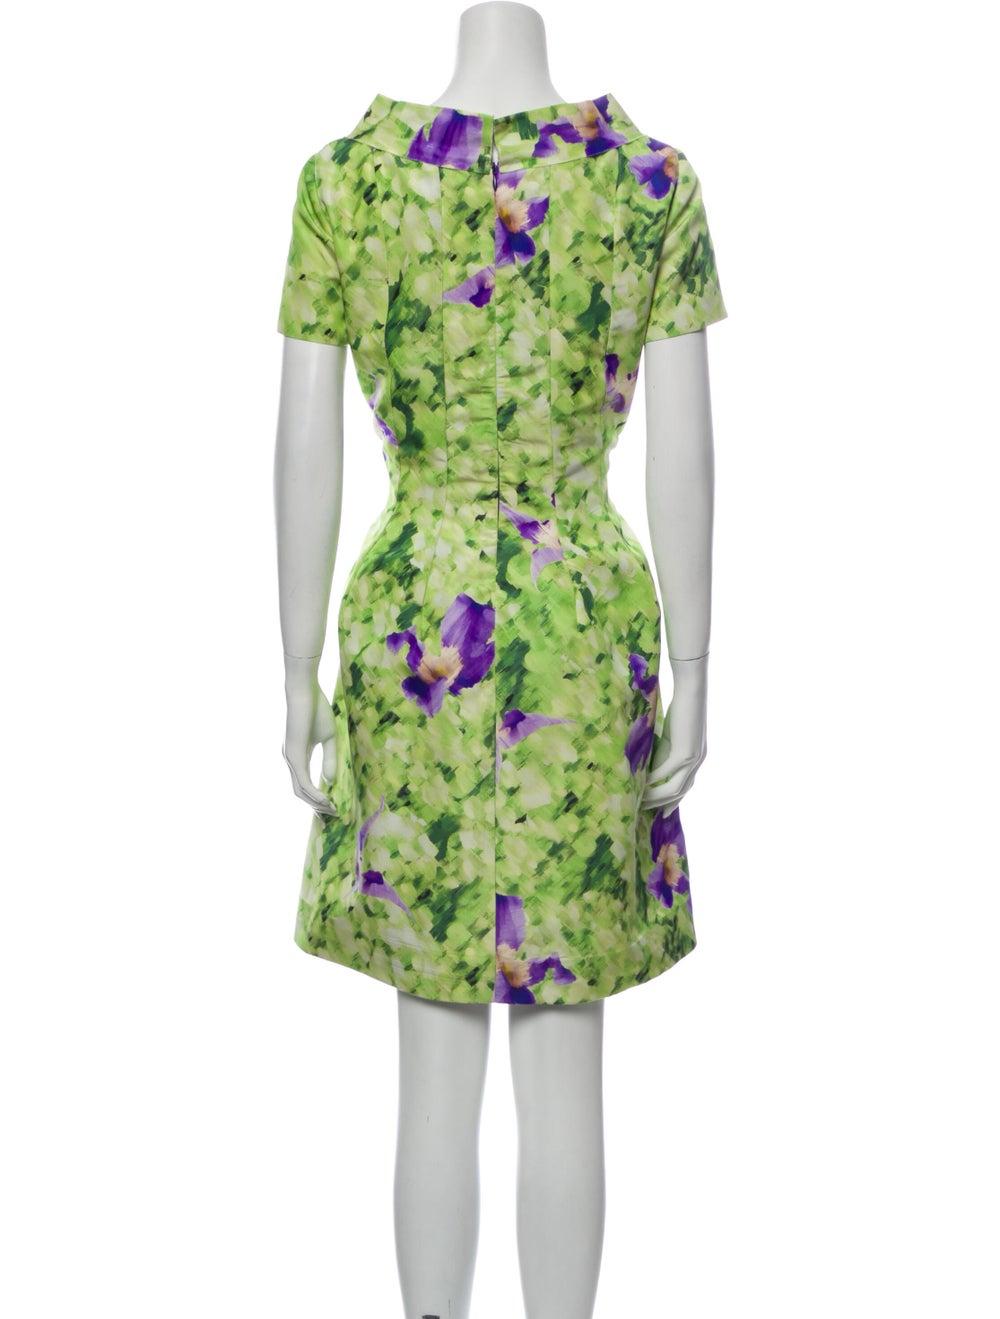 Oscar de la Renta Silk Mini Dress Green - image 3